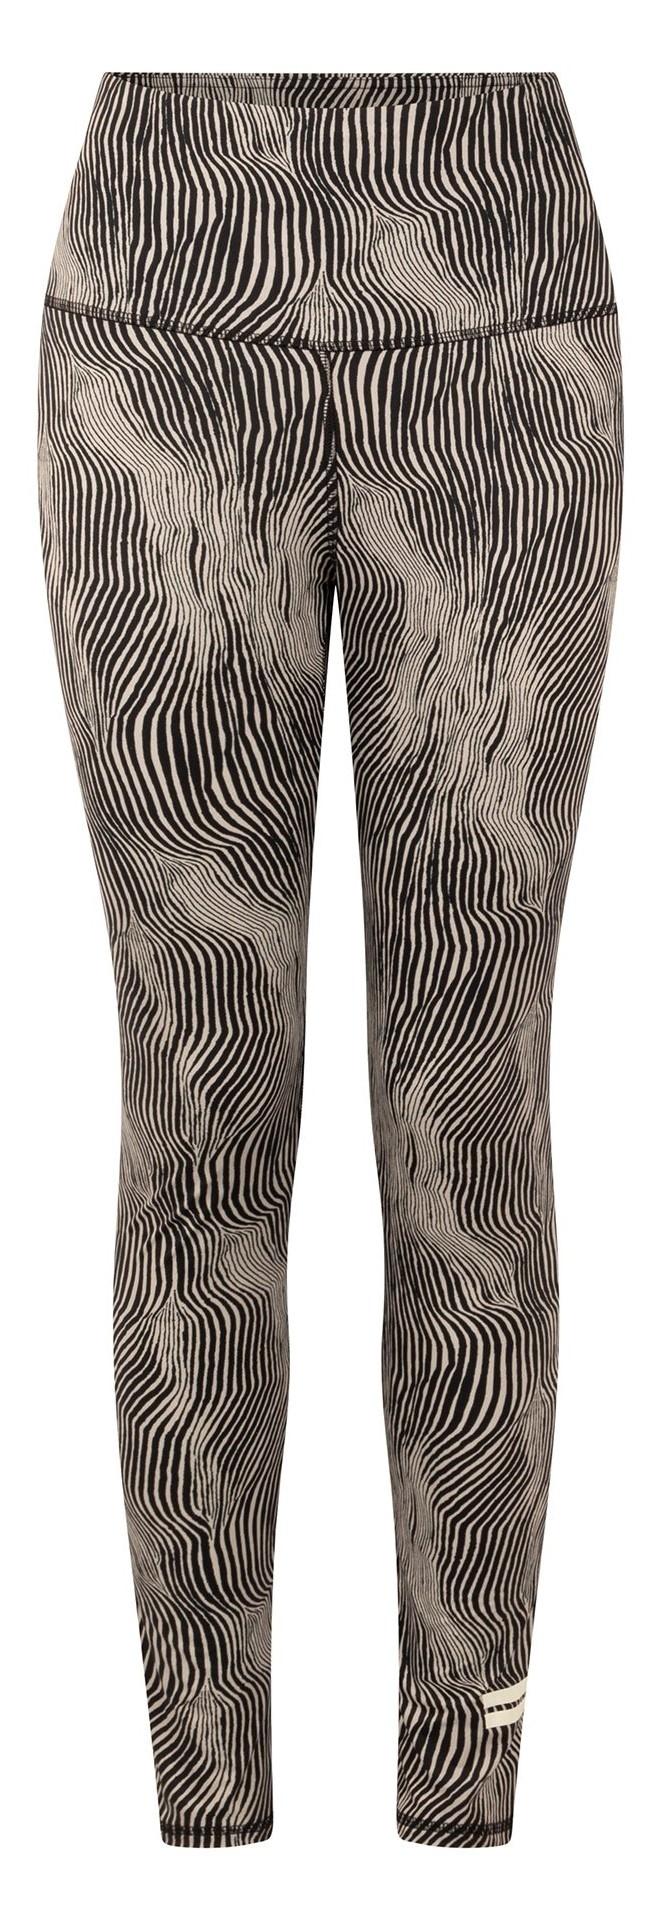 legging Yoga zebra safari-1